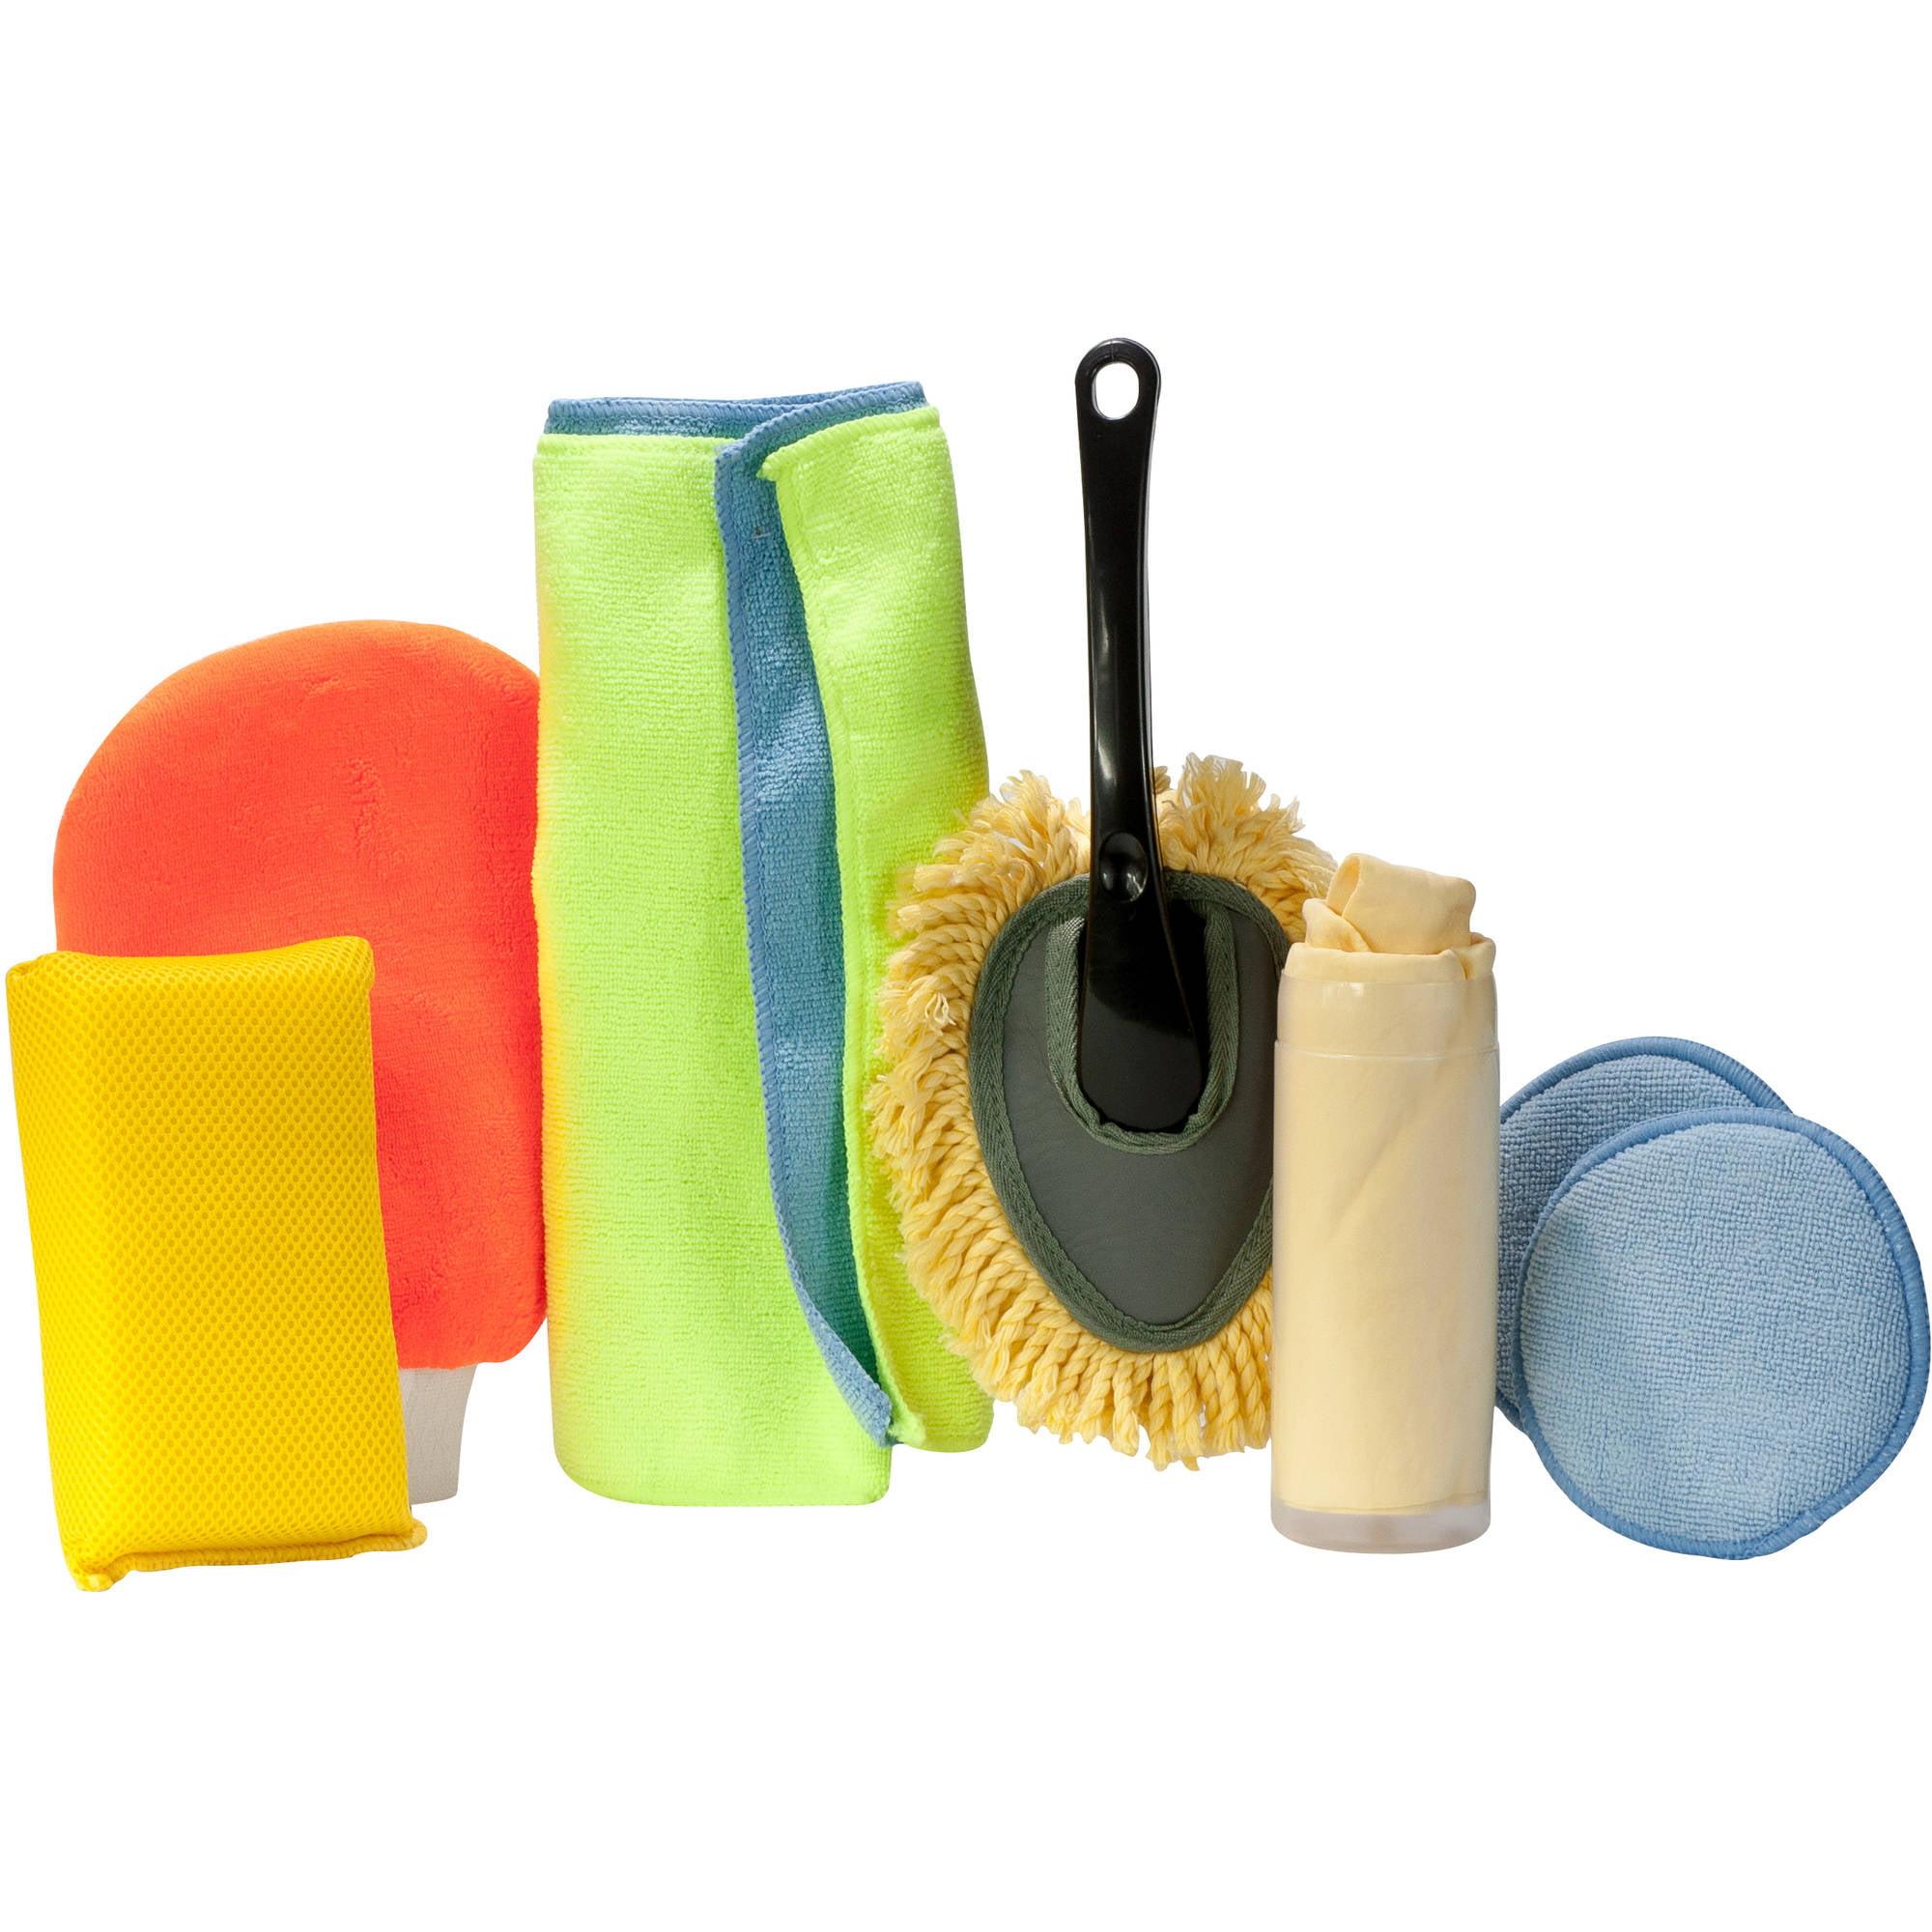 Absorbtex Automotive Wash, Dry & Apply Kit